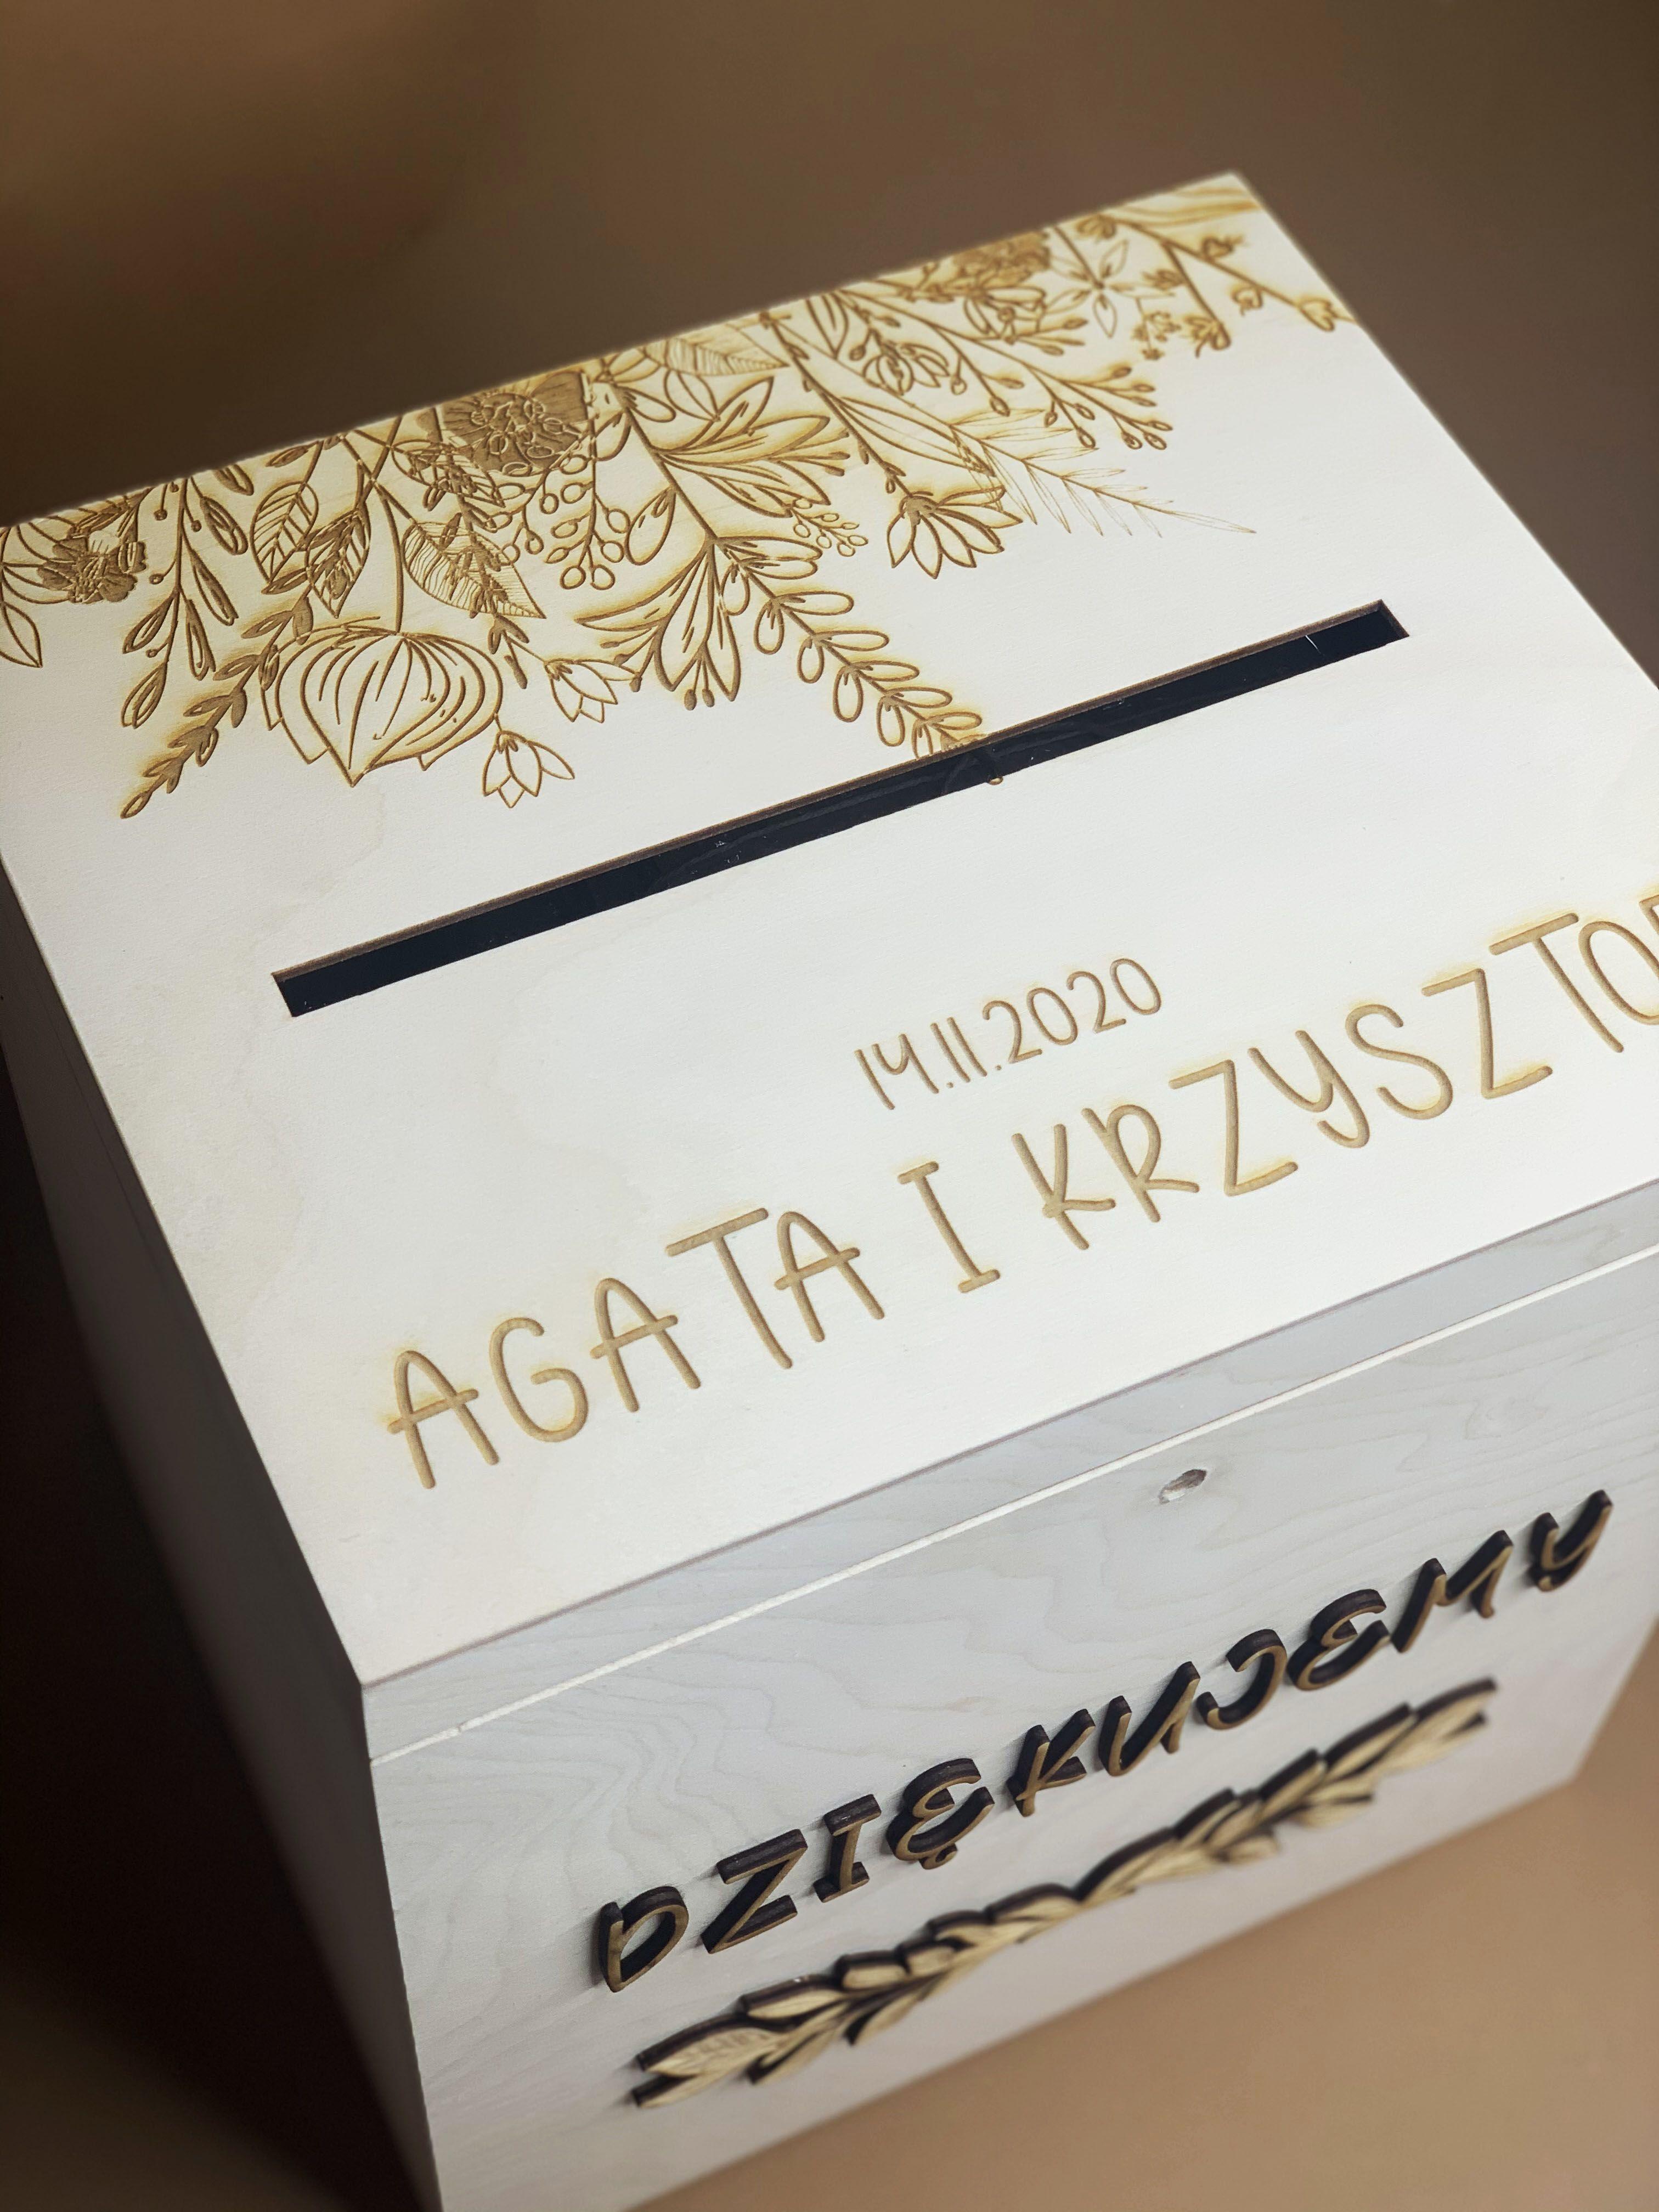 Pudelko Na Koperty Slubne Rustykalne Pudelko Na Koperty Slubne Boho Pudelko Na Koperty Eko Pudelko Na Koperty Drewni Facebook Sign Up Decorative Boxes Security